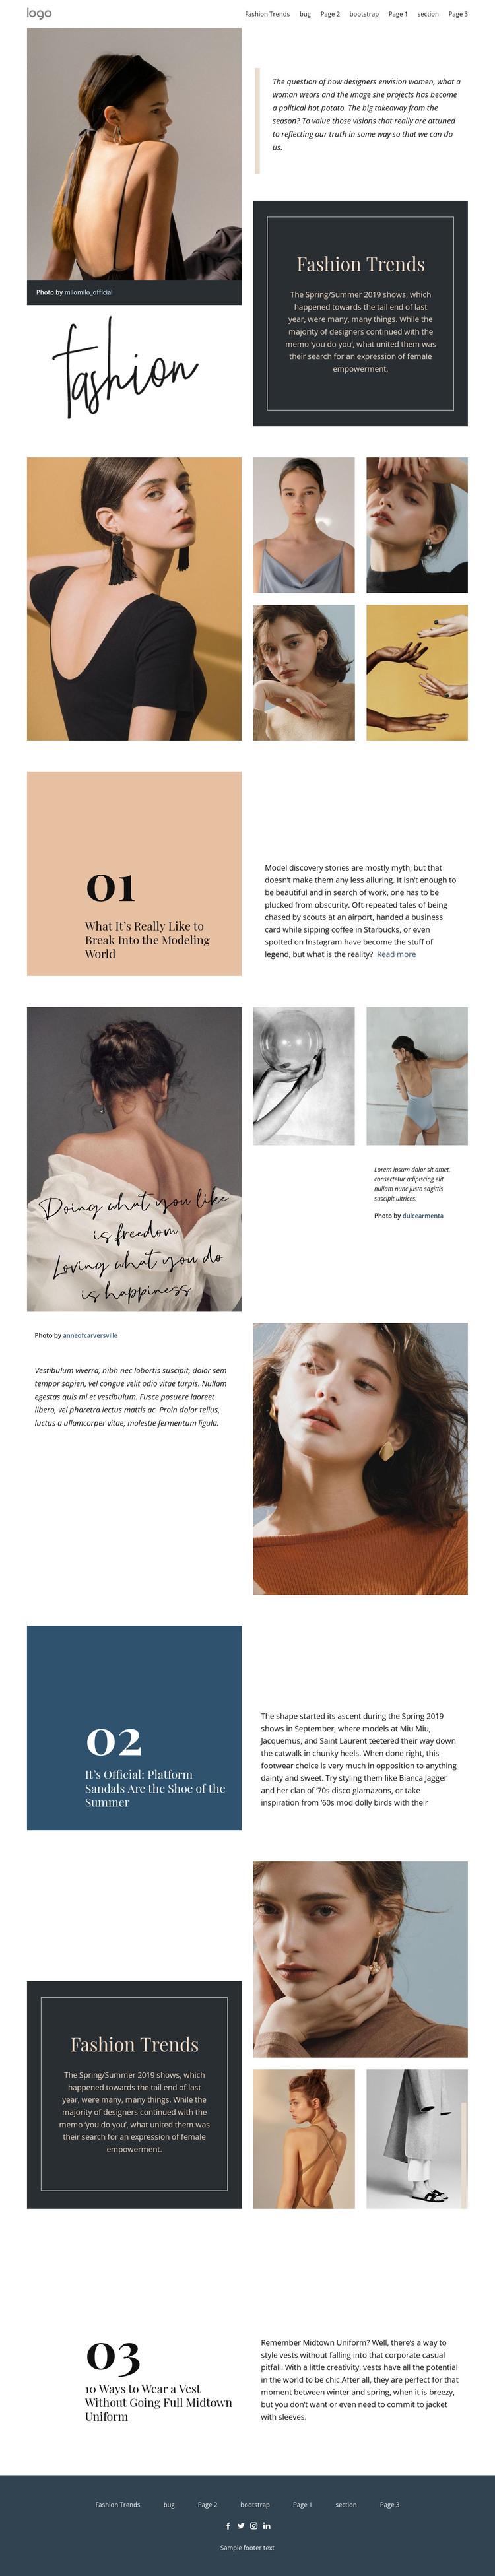 Designer vision of fashion HTML Template